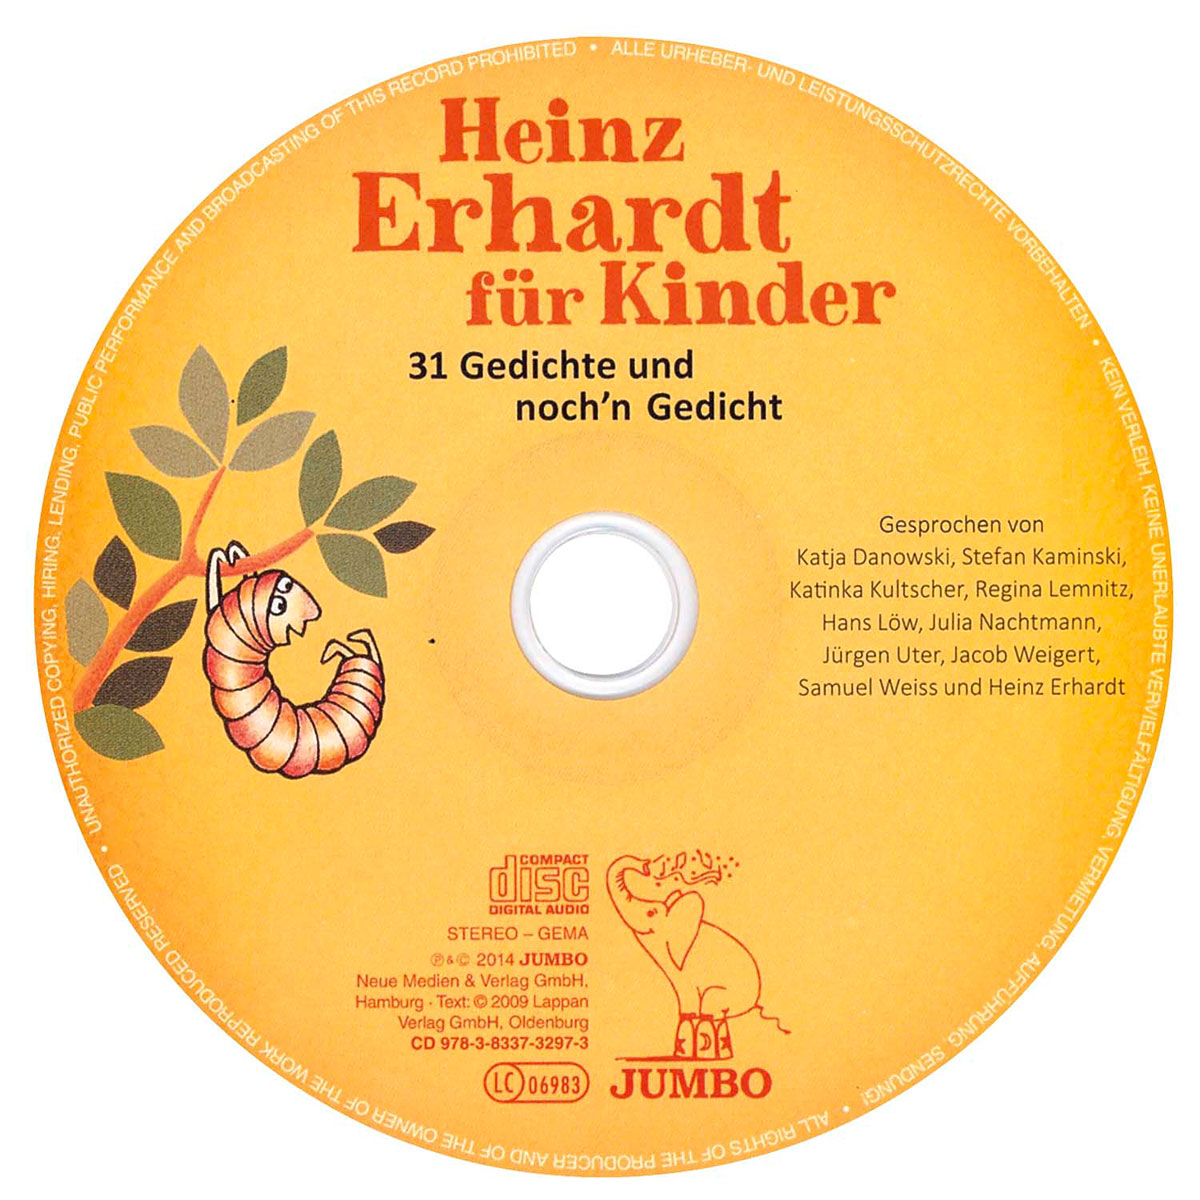 Frühling gedicht heinz erhardt Heinz Erhardt